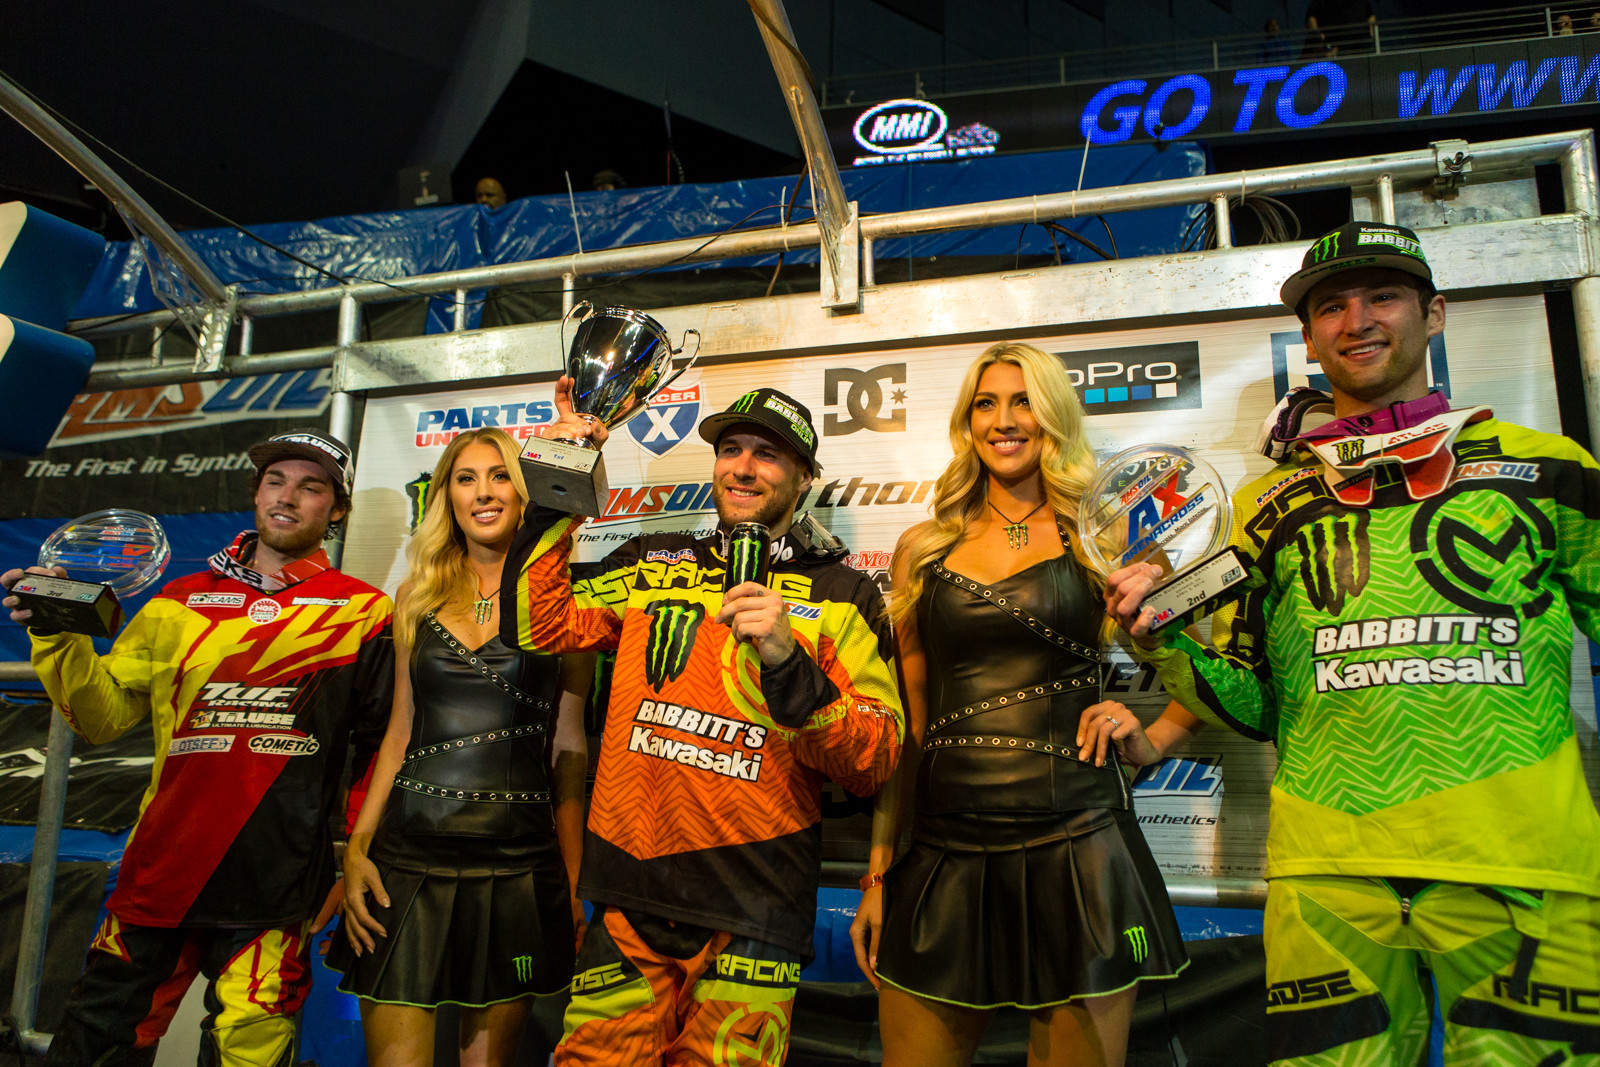 Arenacross Class Podium - Photo Gallery: Ontario Arenacross - Saturday Night - Motocross Pictures - Vital MX